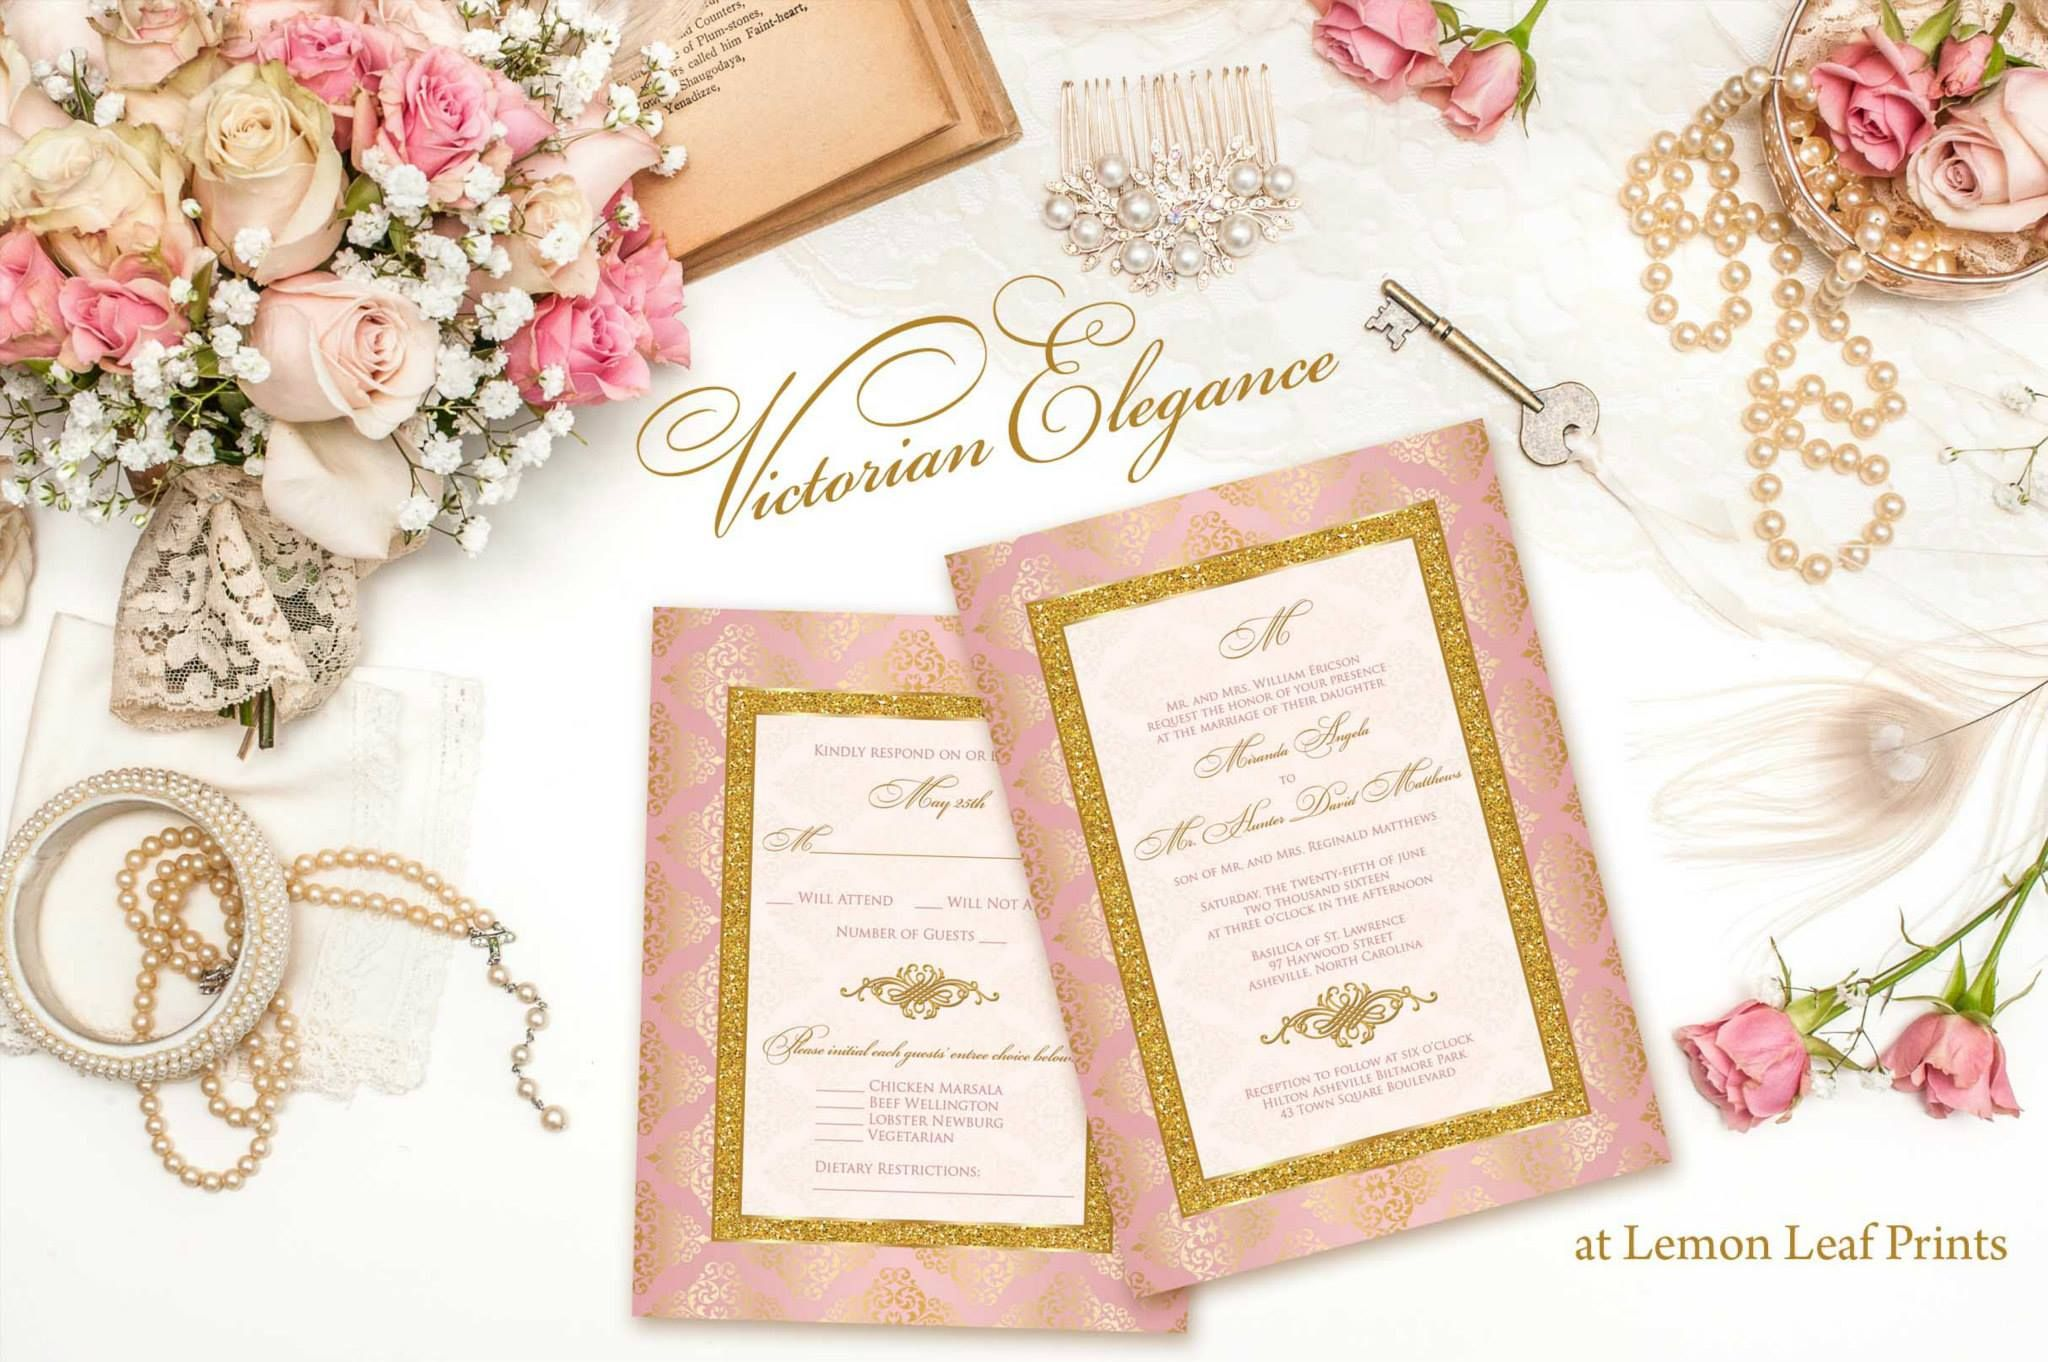 wedding invitation victorian elegance blush pink gold damask